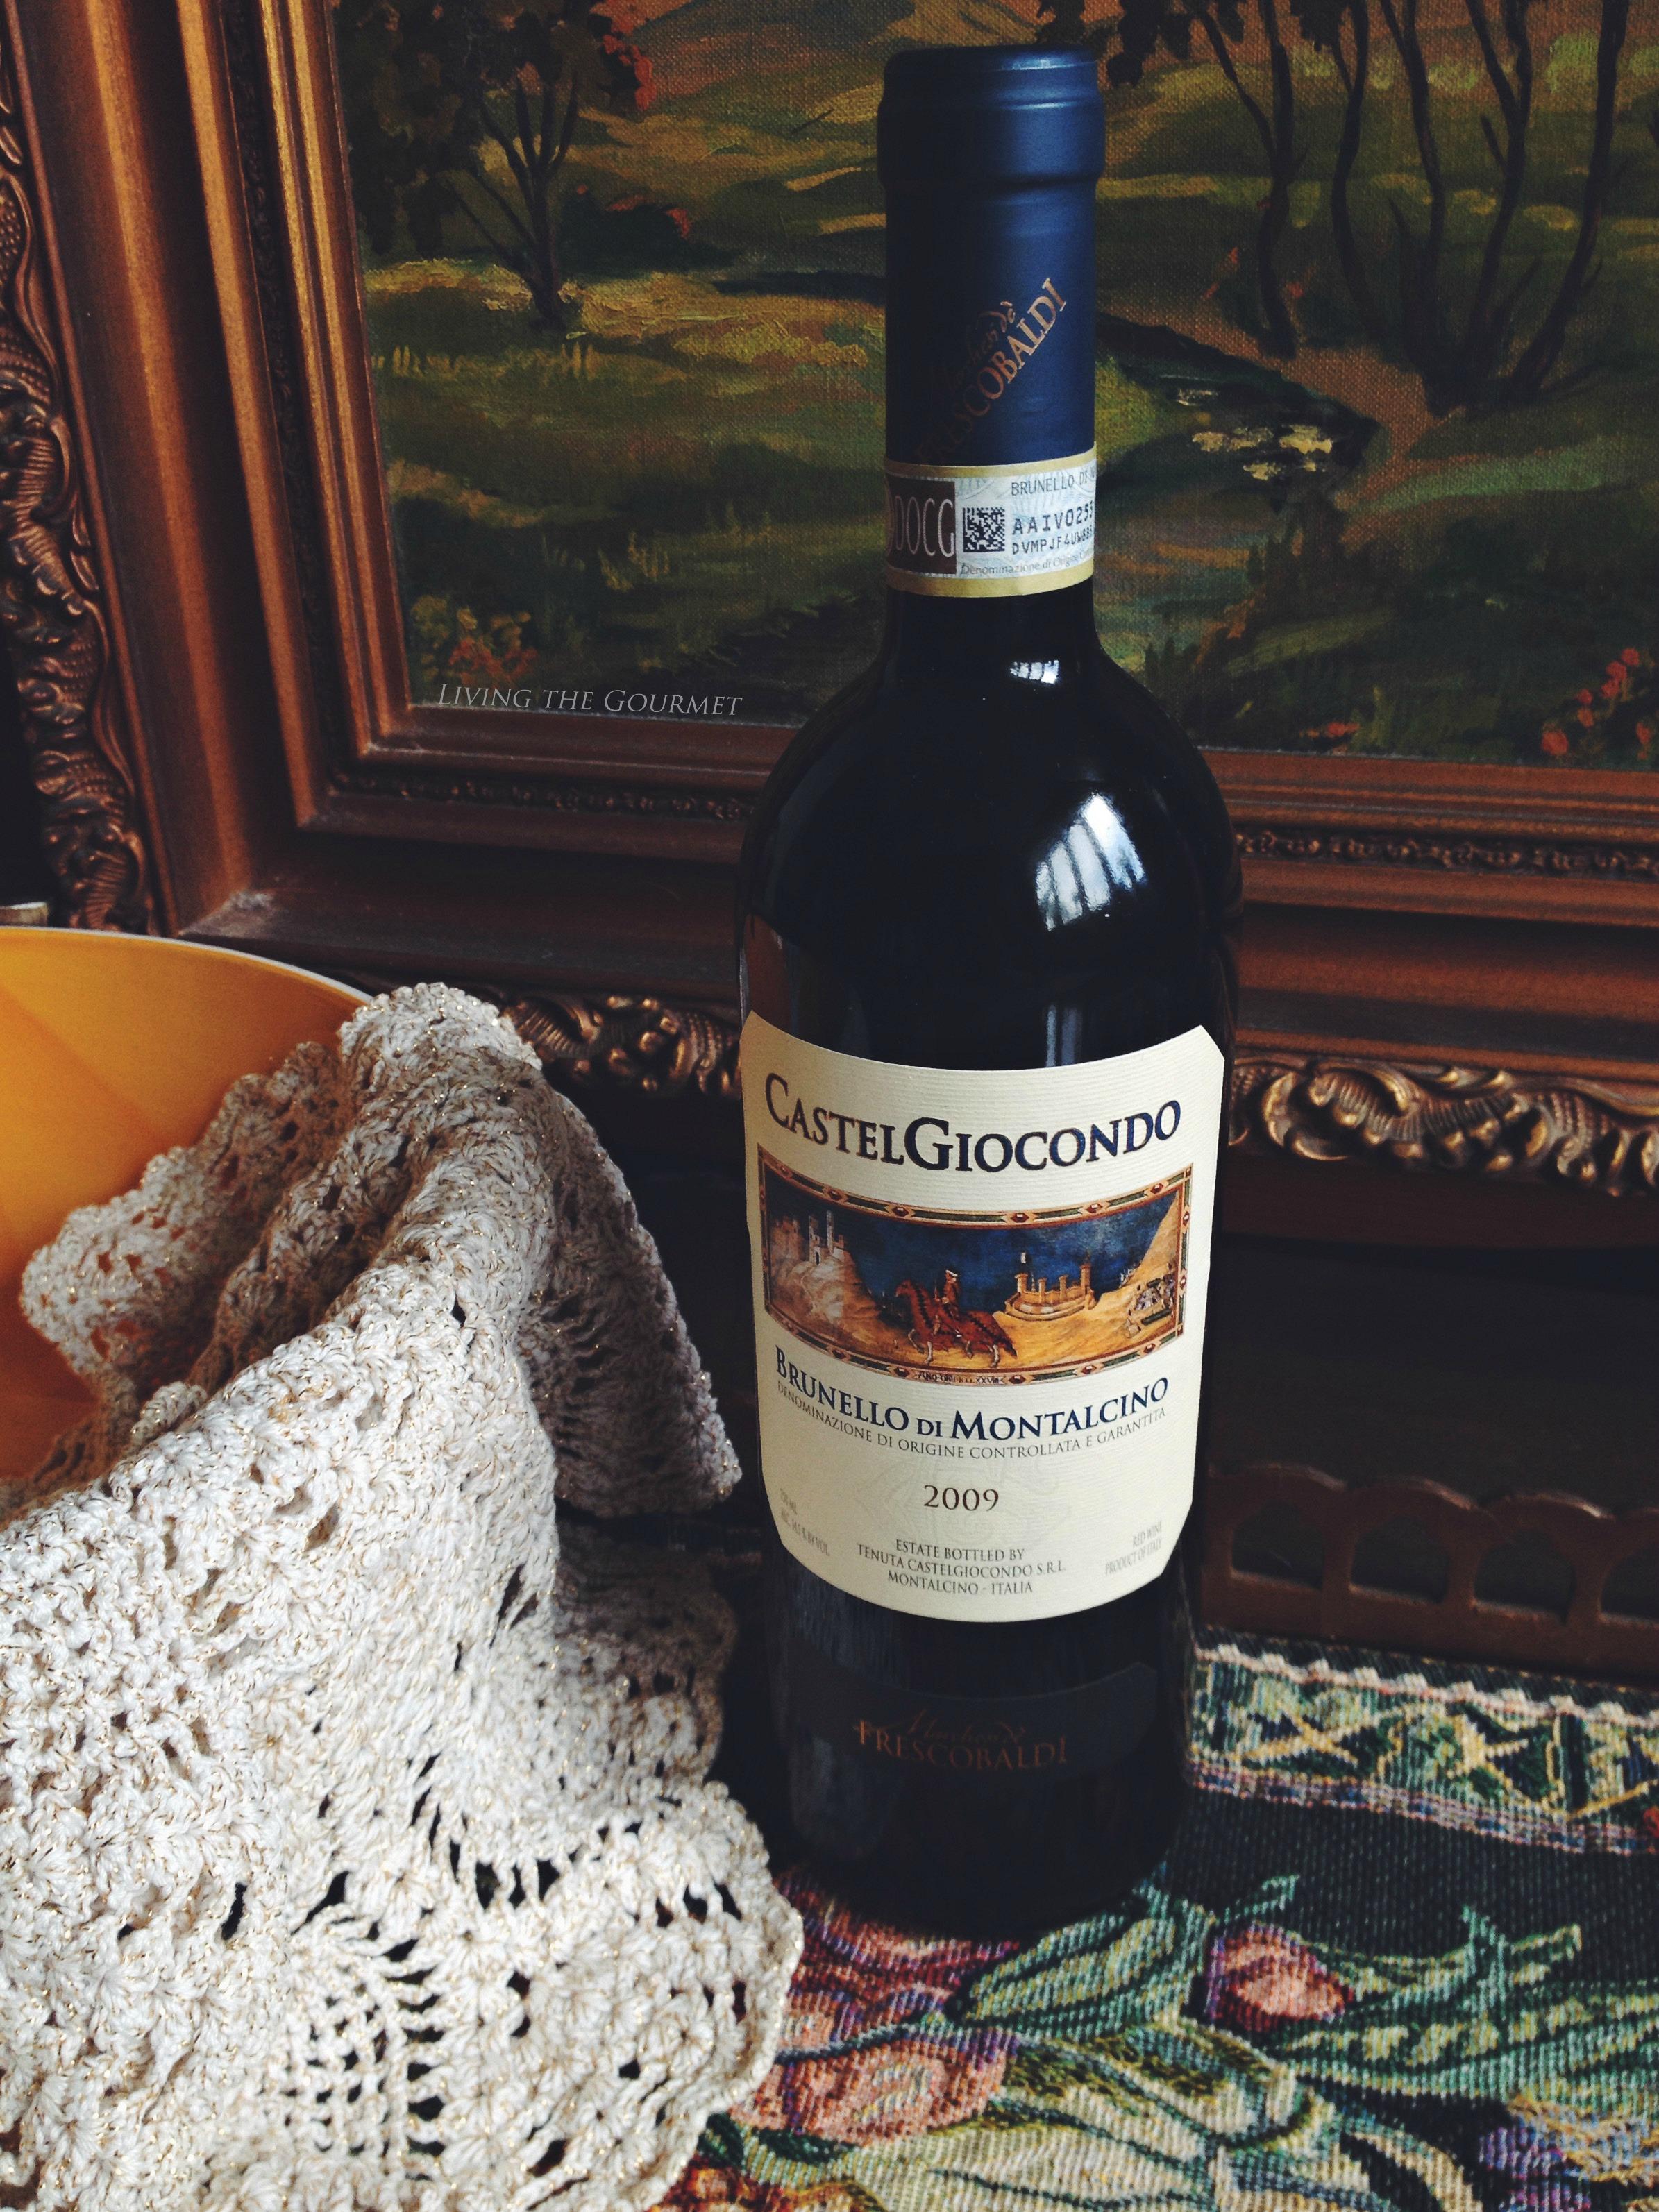 LTG Wine Review: CastelGiocondo